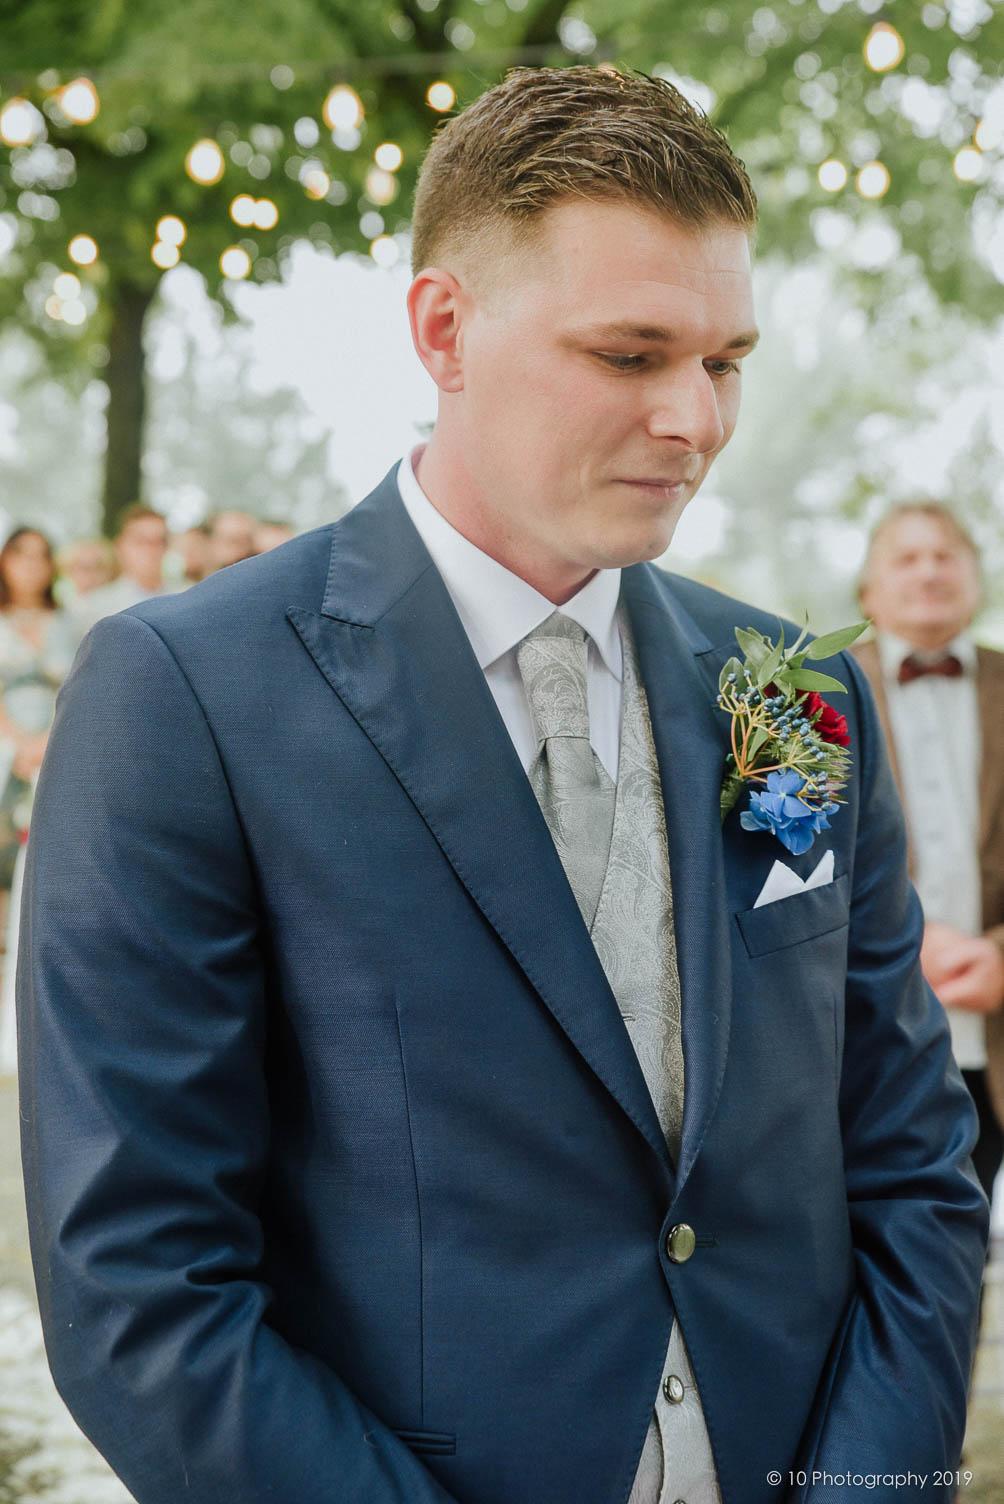 outfit sposo Matrimonio autunnale boho chic a Modena